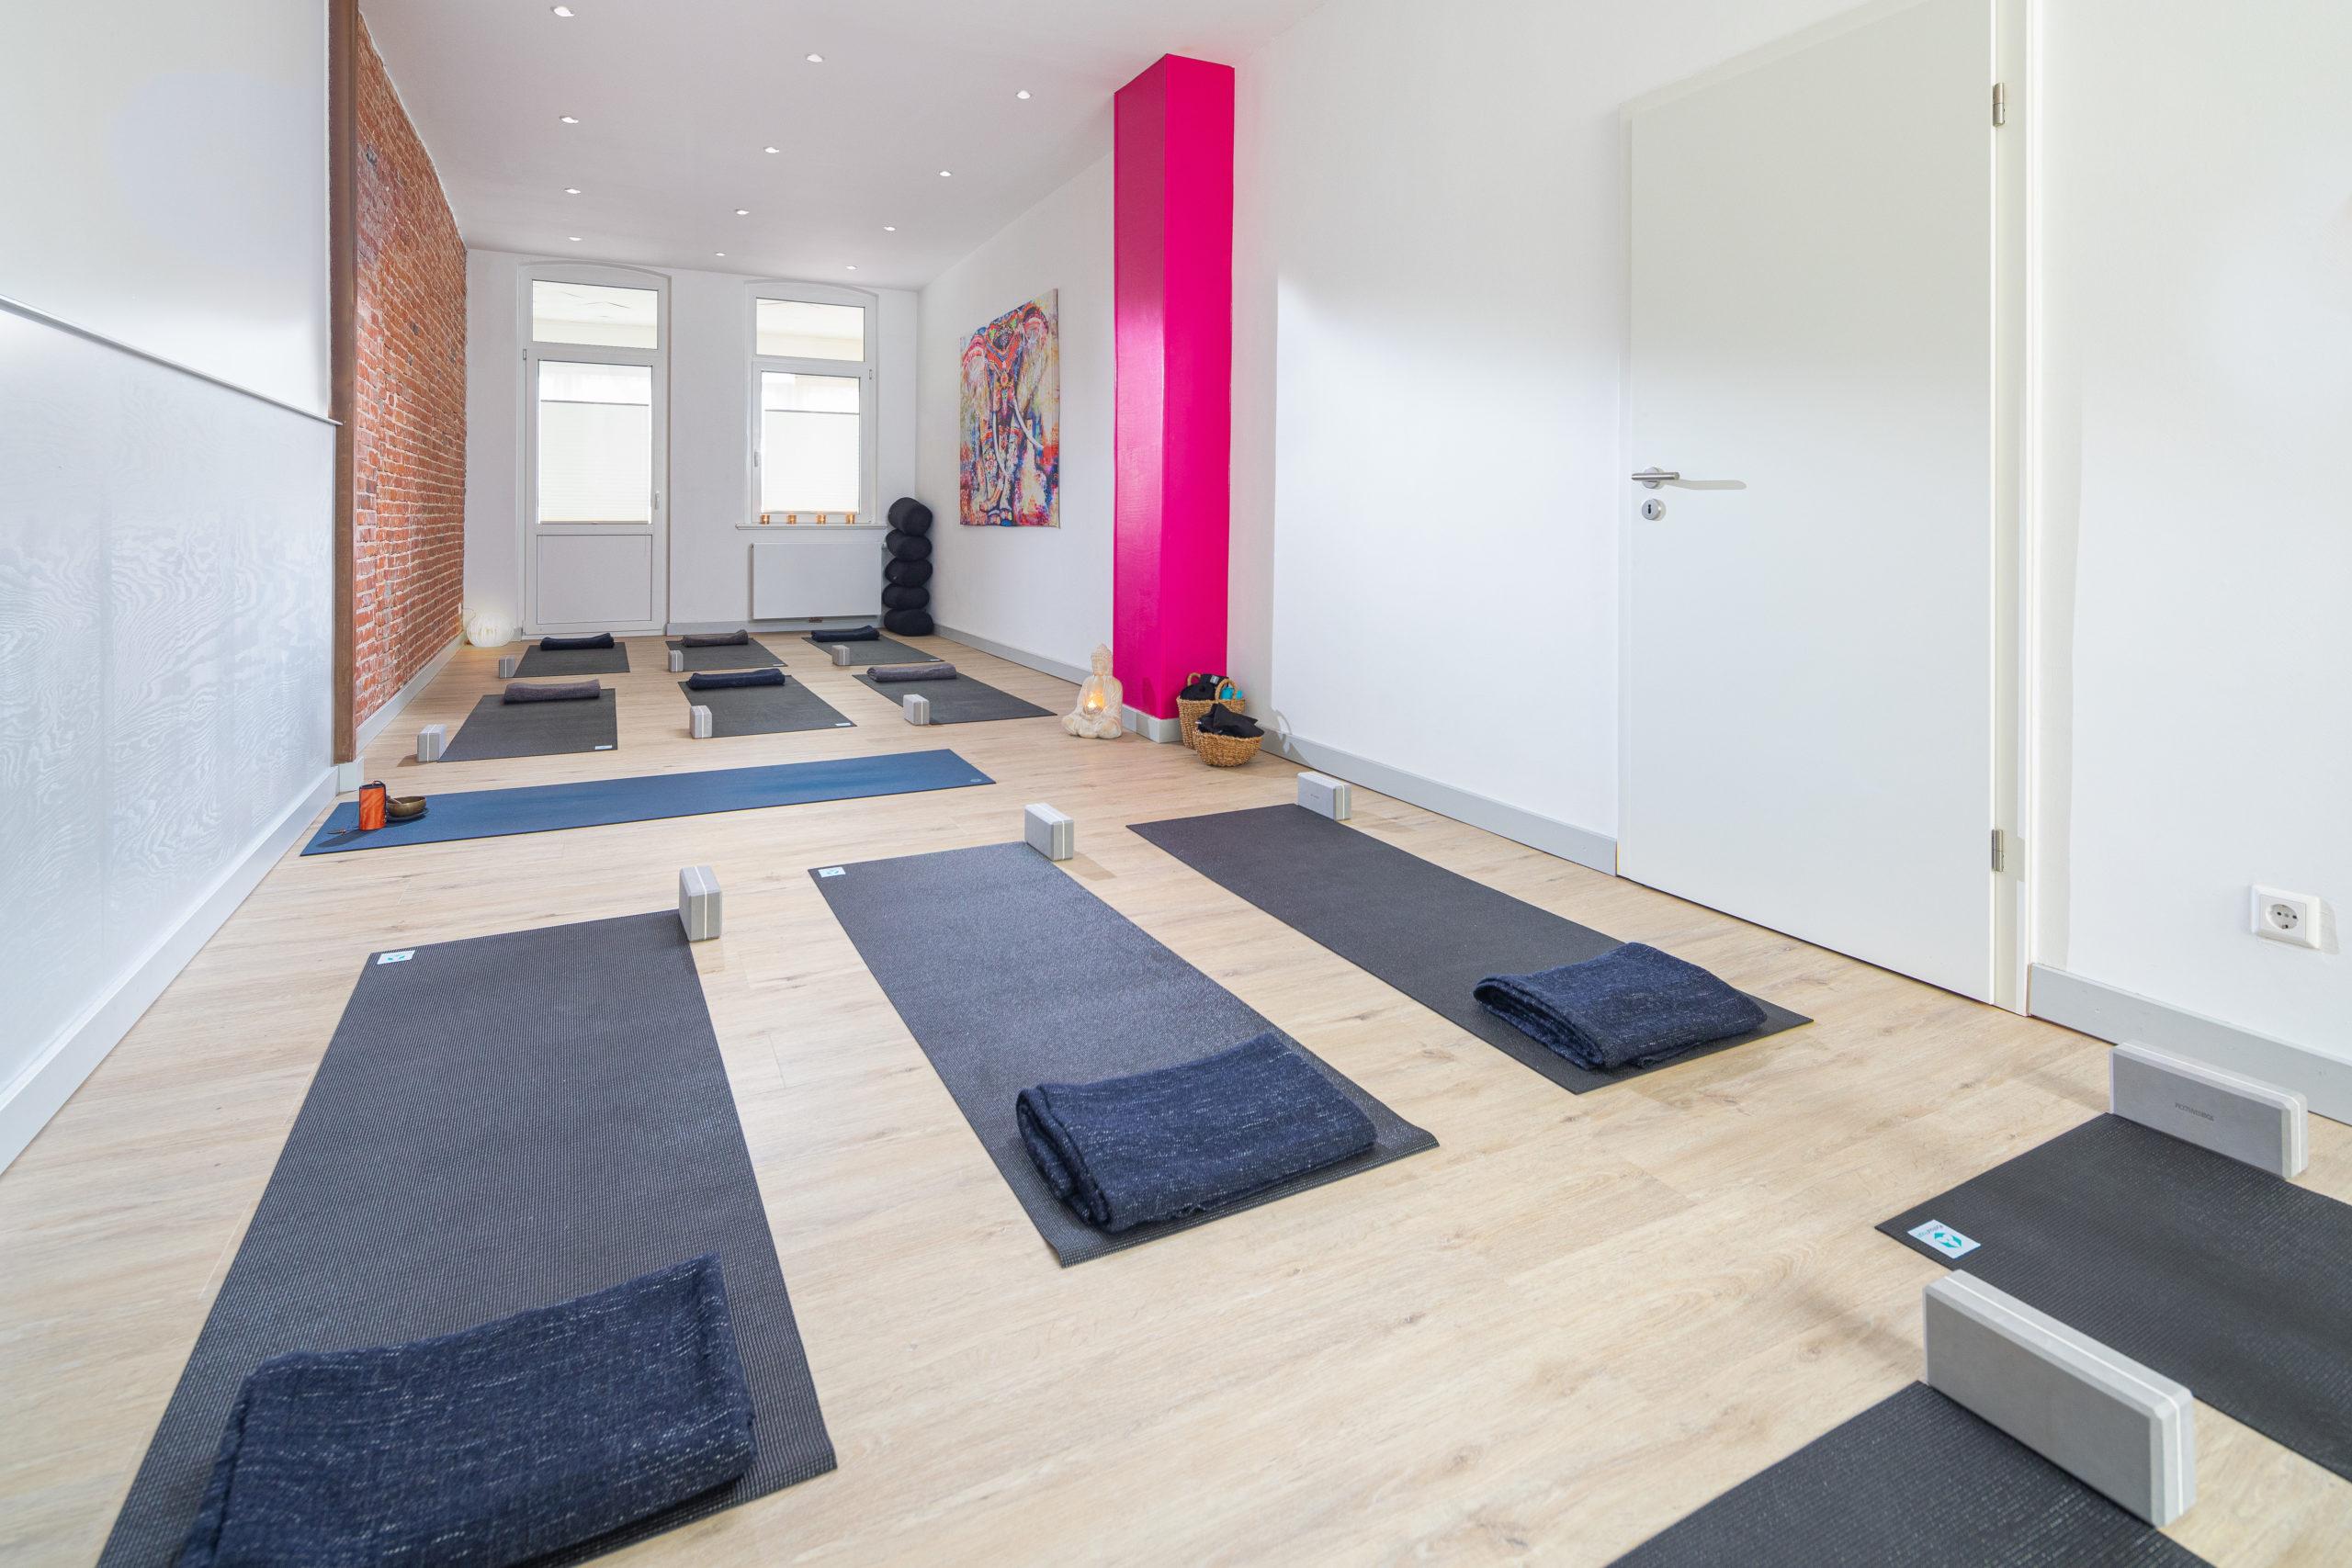 Norderney Yogaraum UNIT Yoga Ausbildung